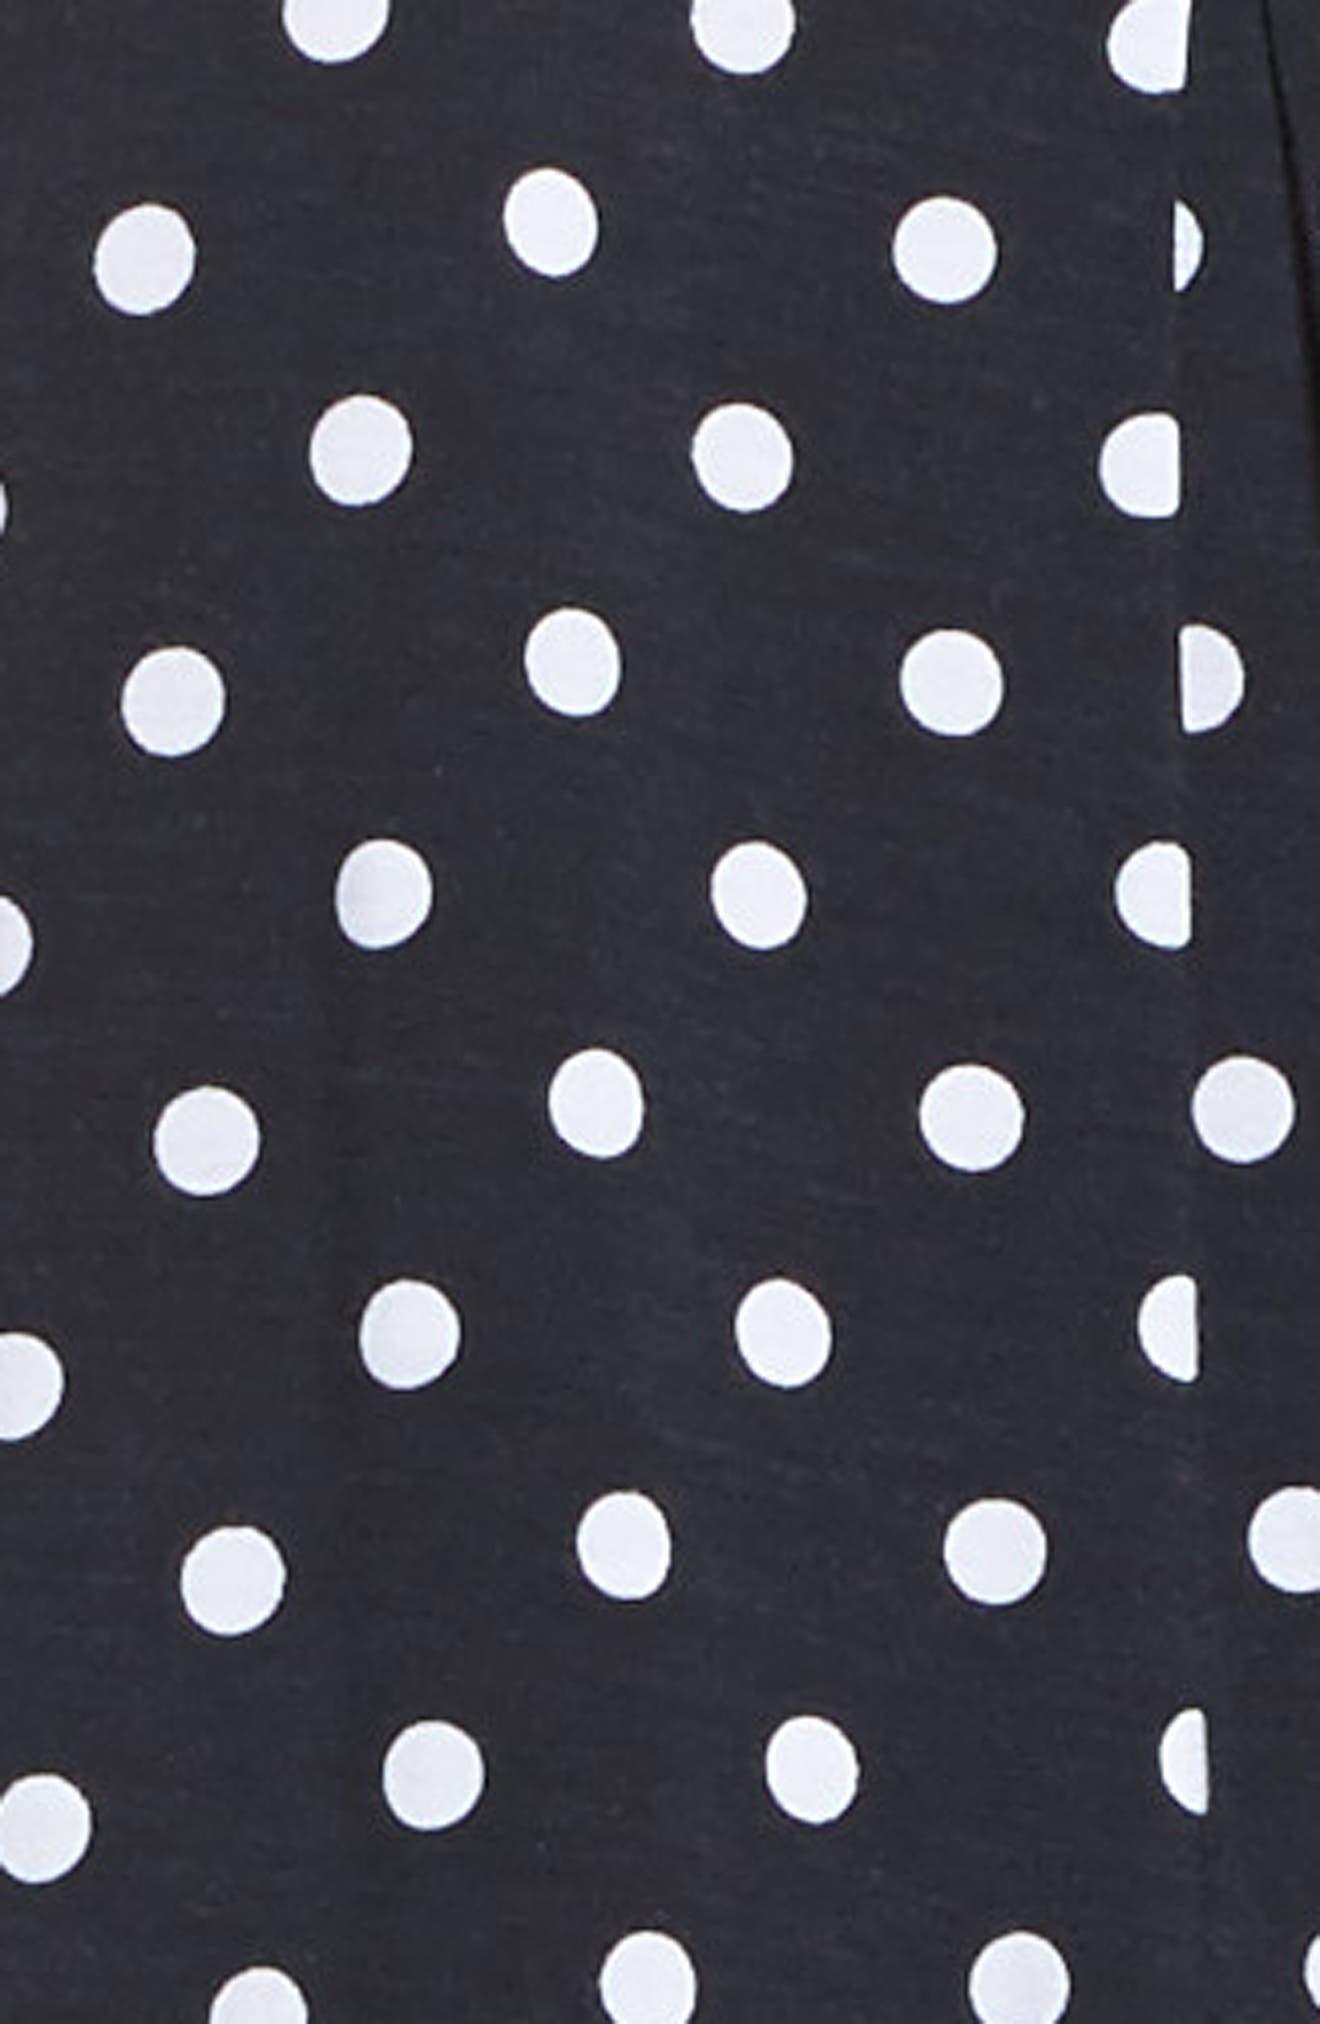 Stretch Modal Pajamas & Eye Mask,                             Alternate thumbnail 5, color,                             001